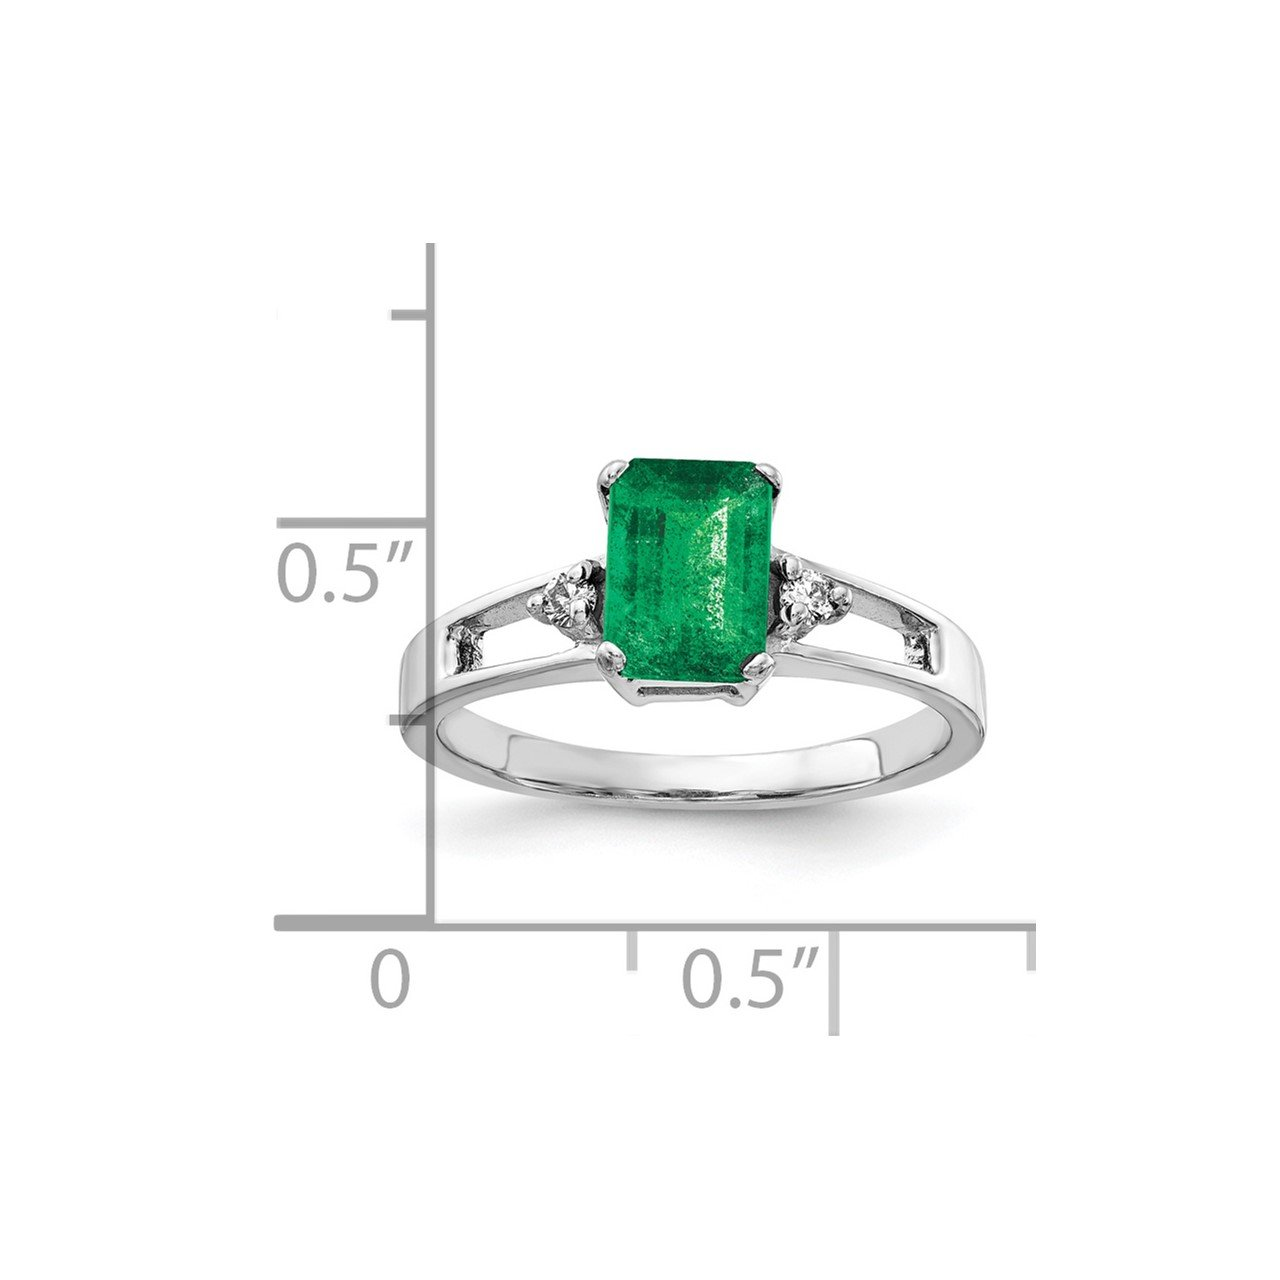 14k White Gold 7x5mm Emerald Cut Emerald AA Diamond ring-1